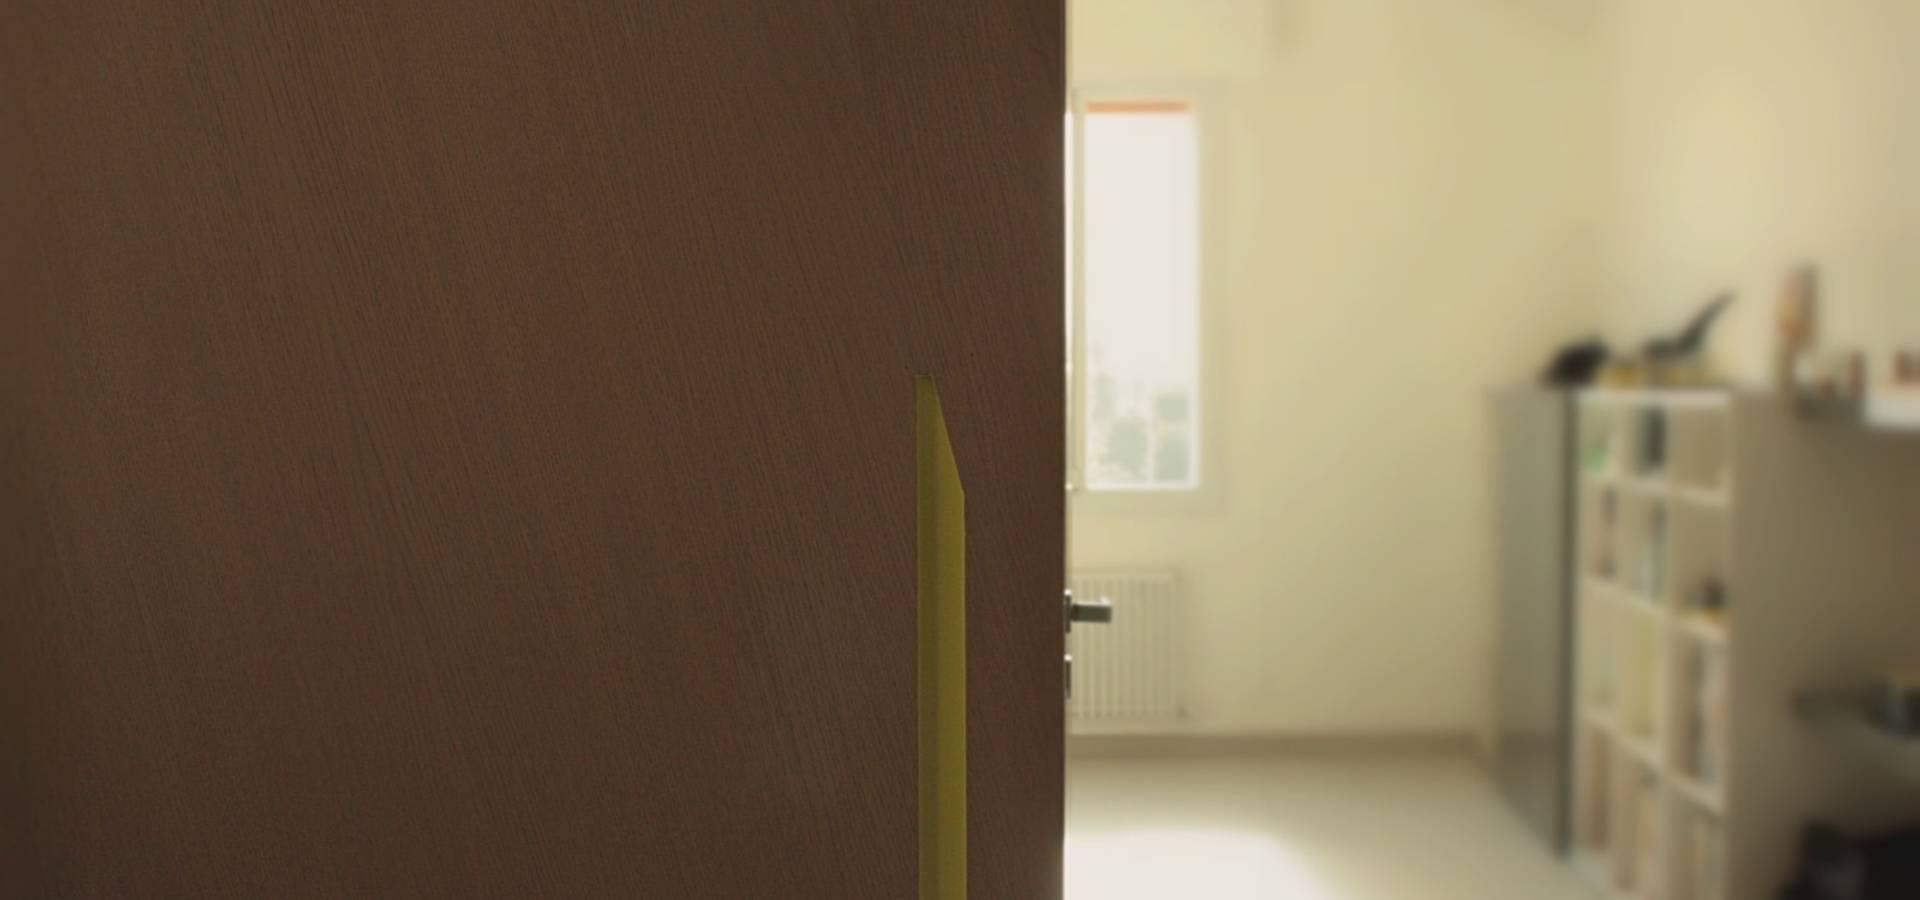 Sede uaig by uaig ufficio architettura interni grammauta for Interni architettura